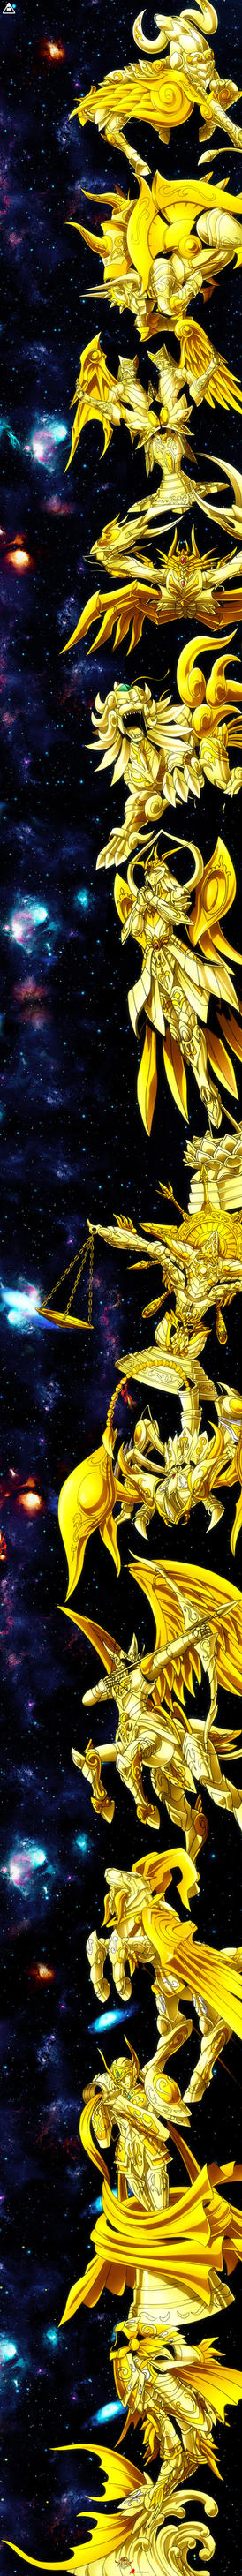 Saint Seiya Soul of Gold - Gold God Cloths by SaintAldebaran